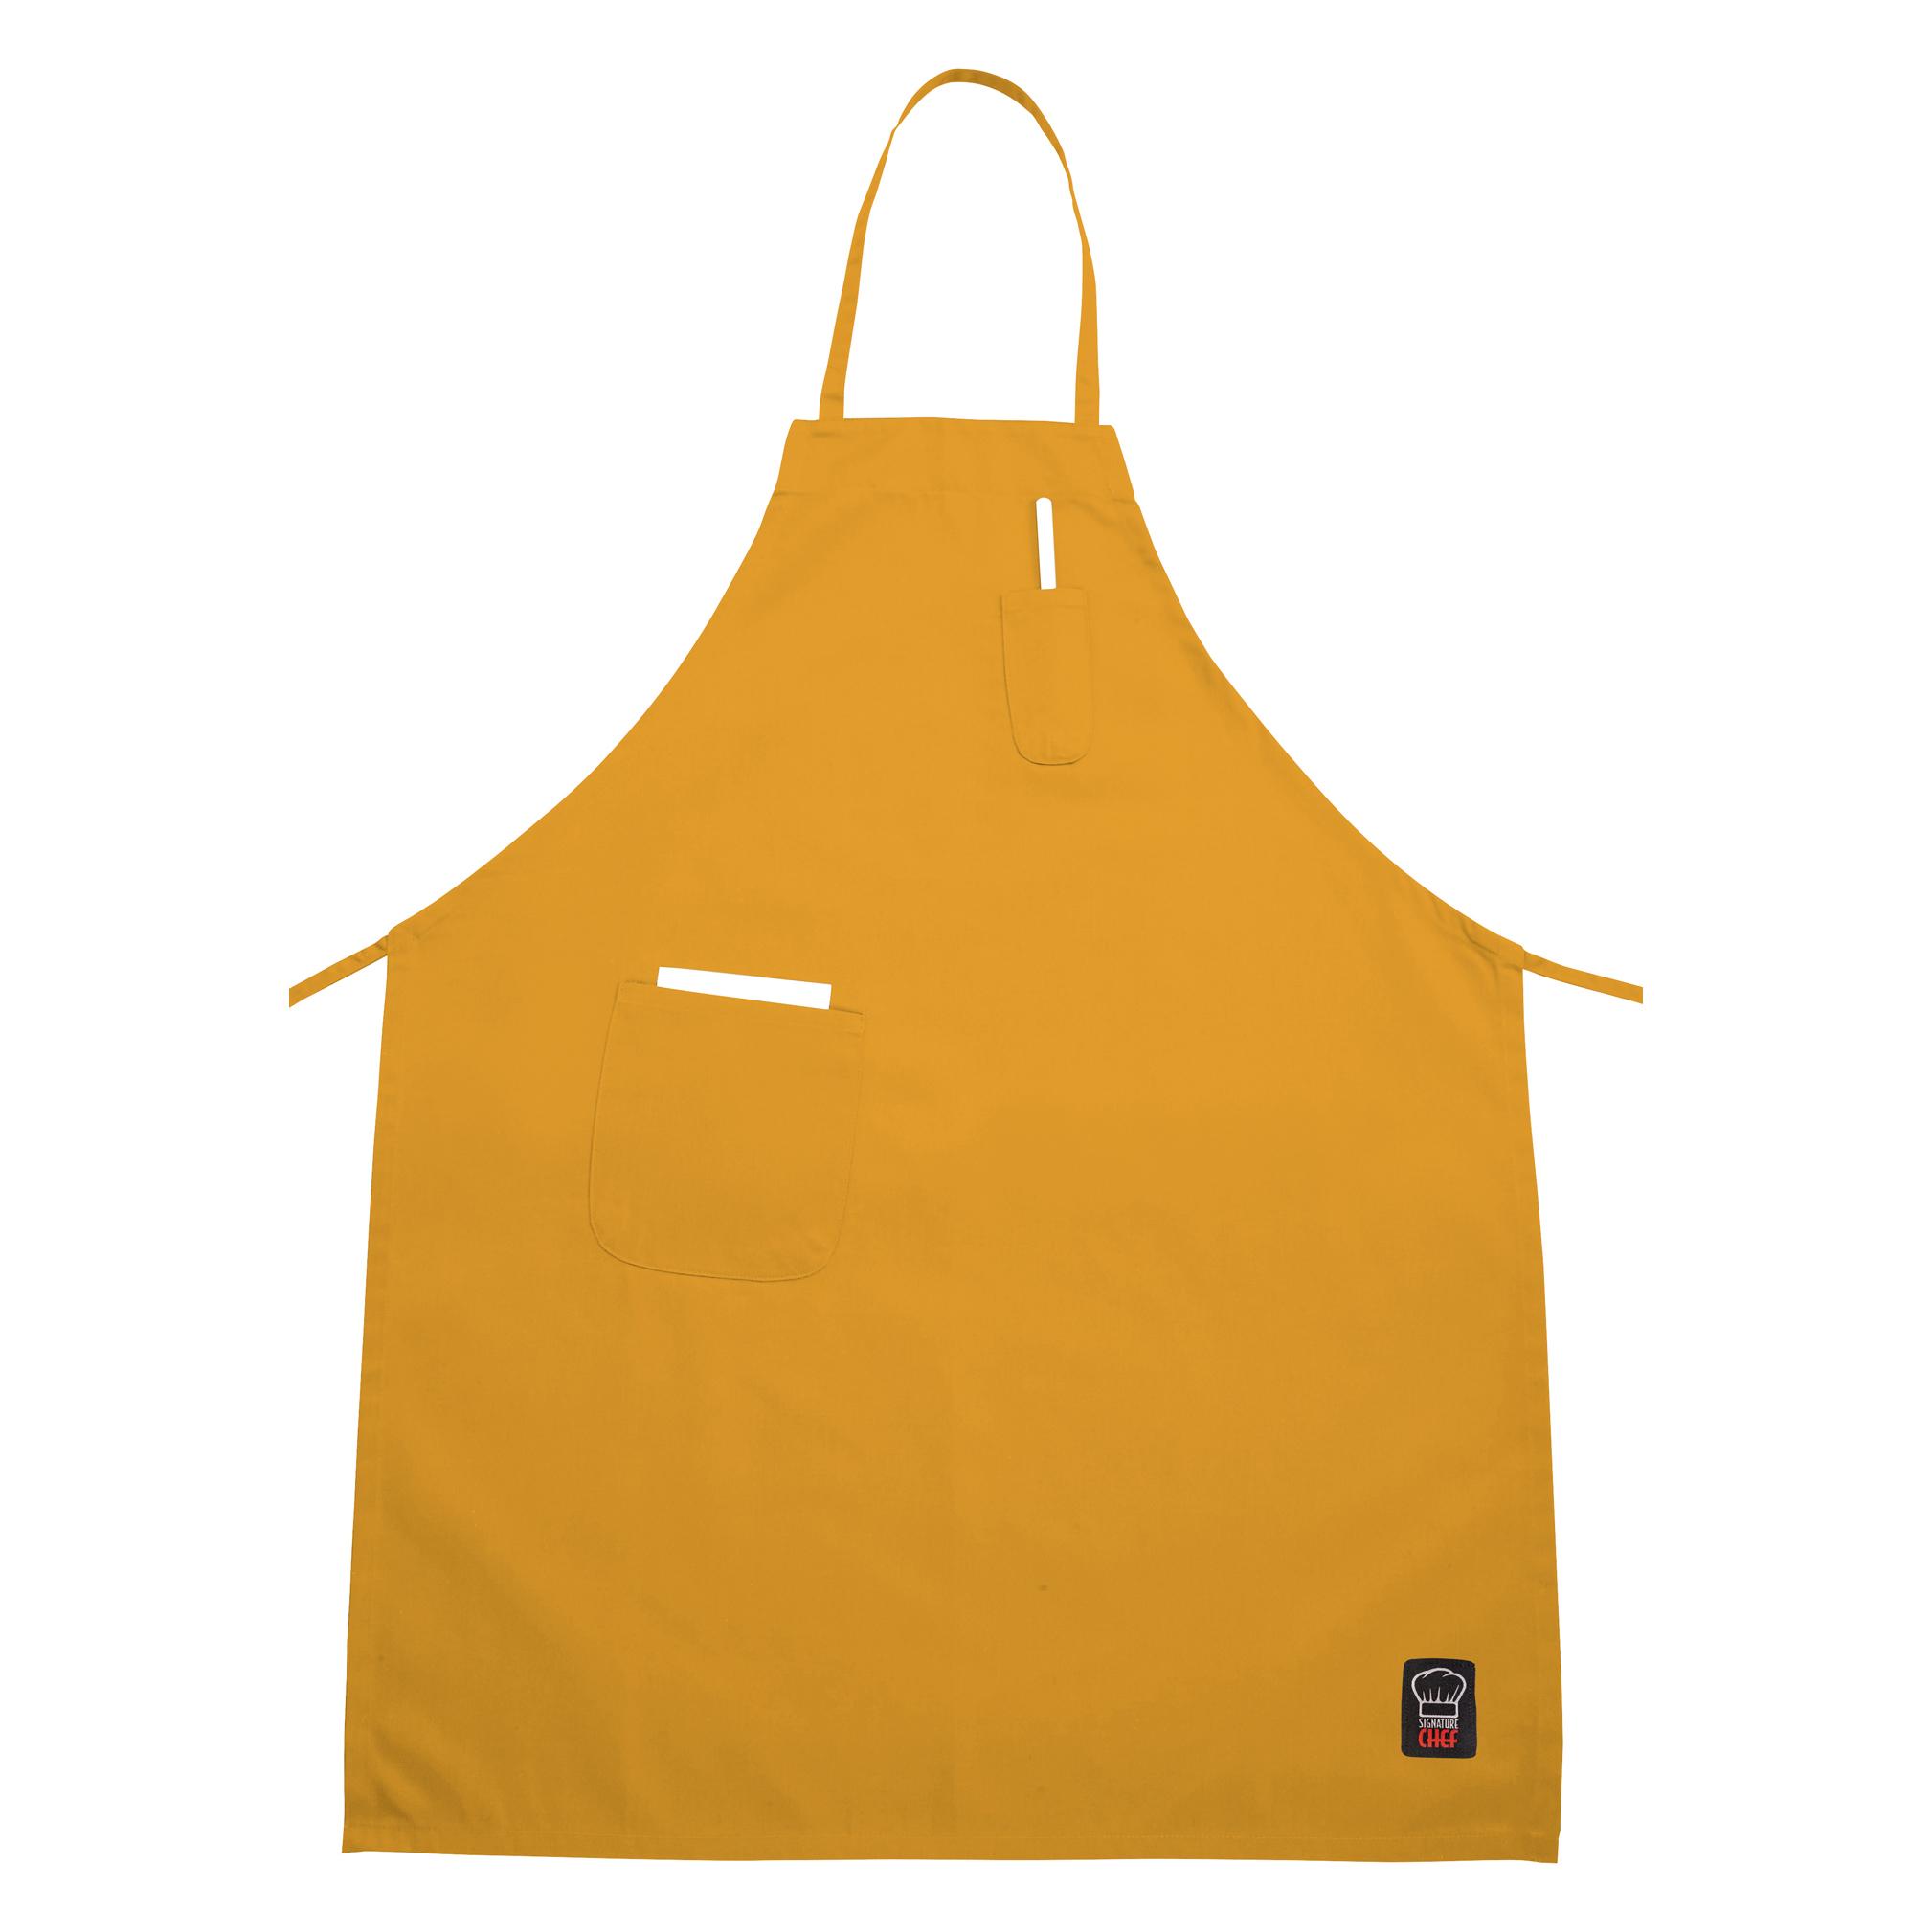 Winco BA-PYL bib apron